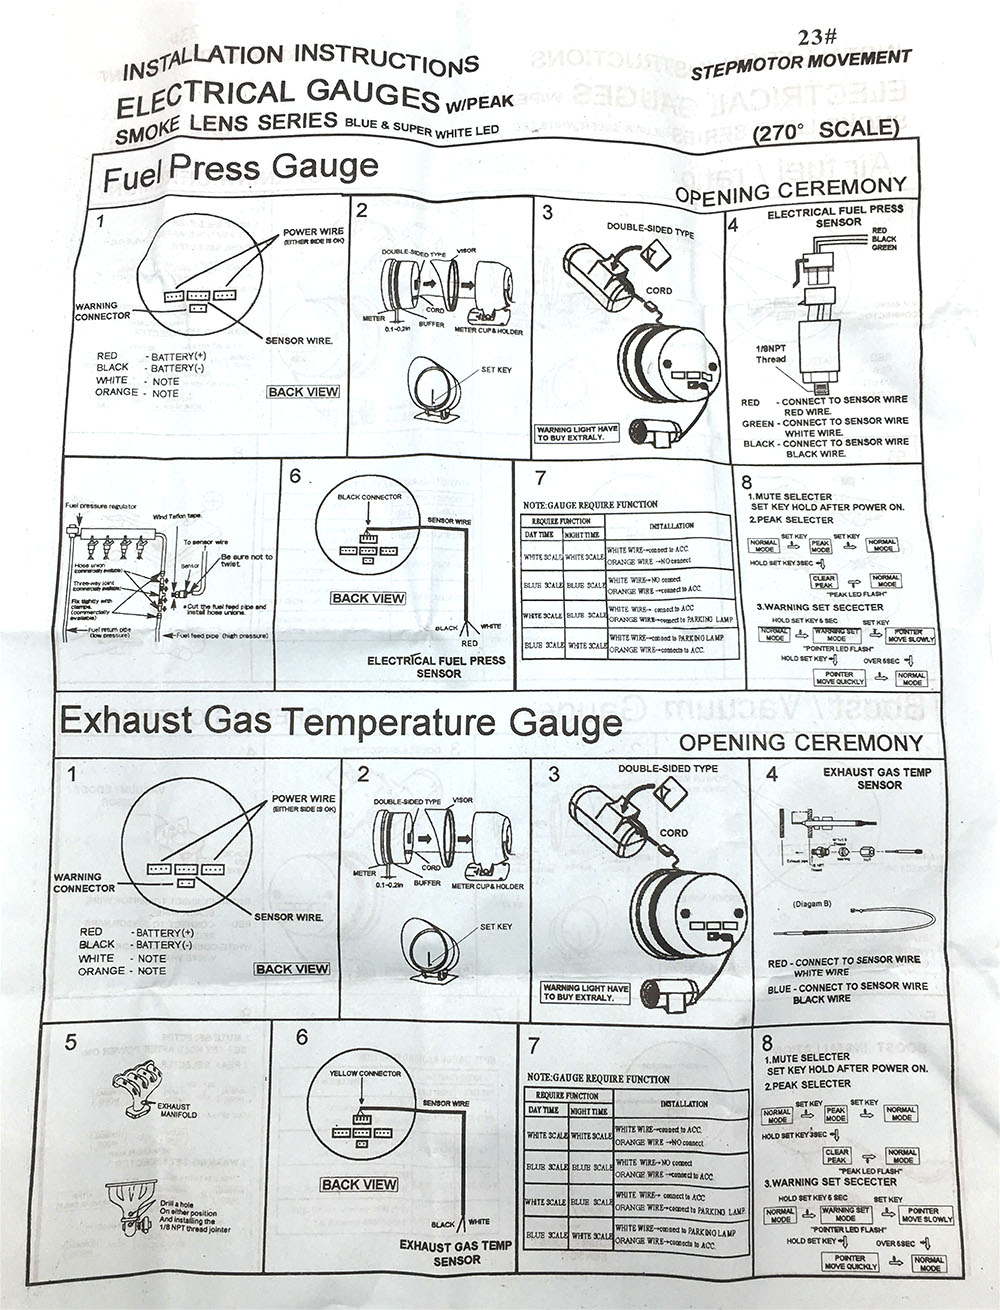 small resolution of air fuel ratio gauge exhaust gas temperature gauge tachometer gauge boost gauge vacuum gauge oil temperature water temperature oil pressure gauge voltmeter